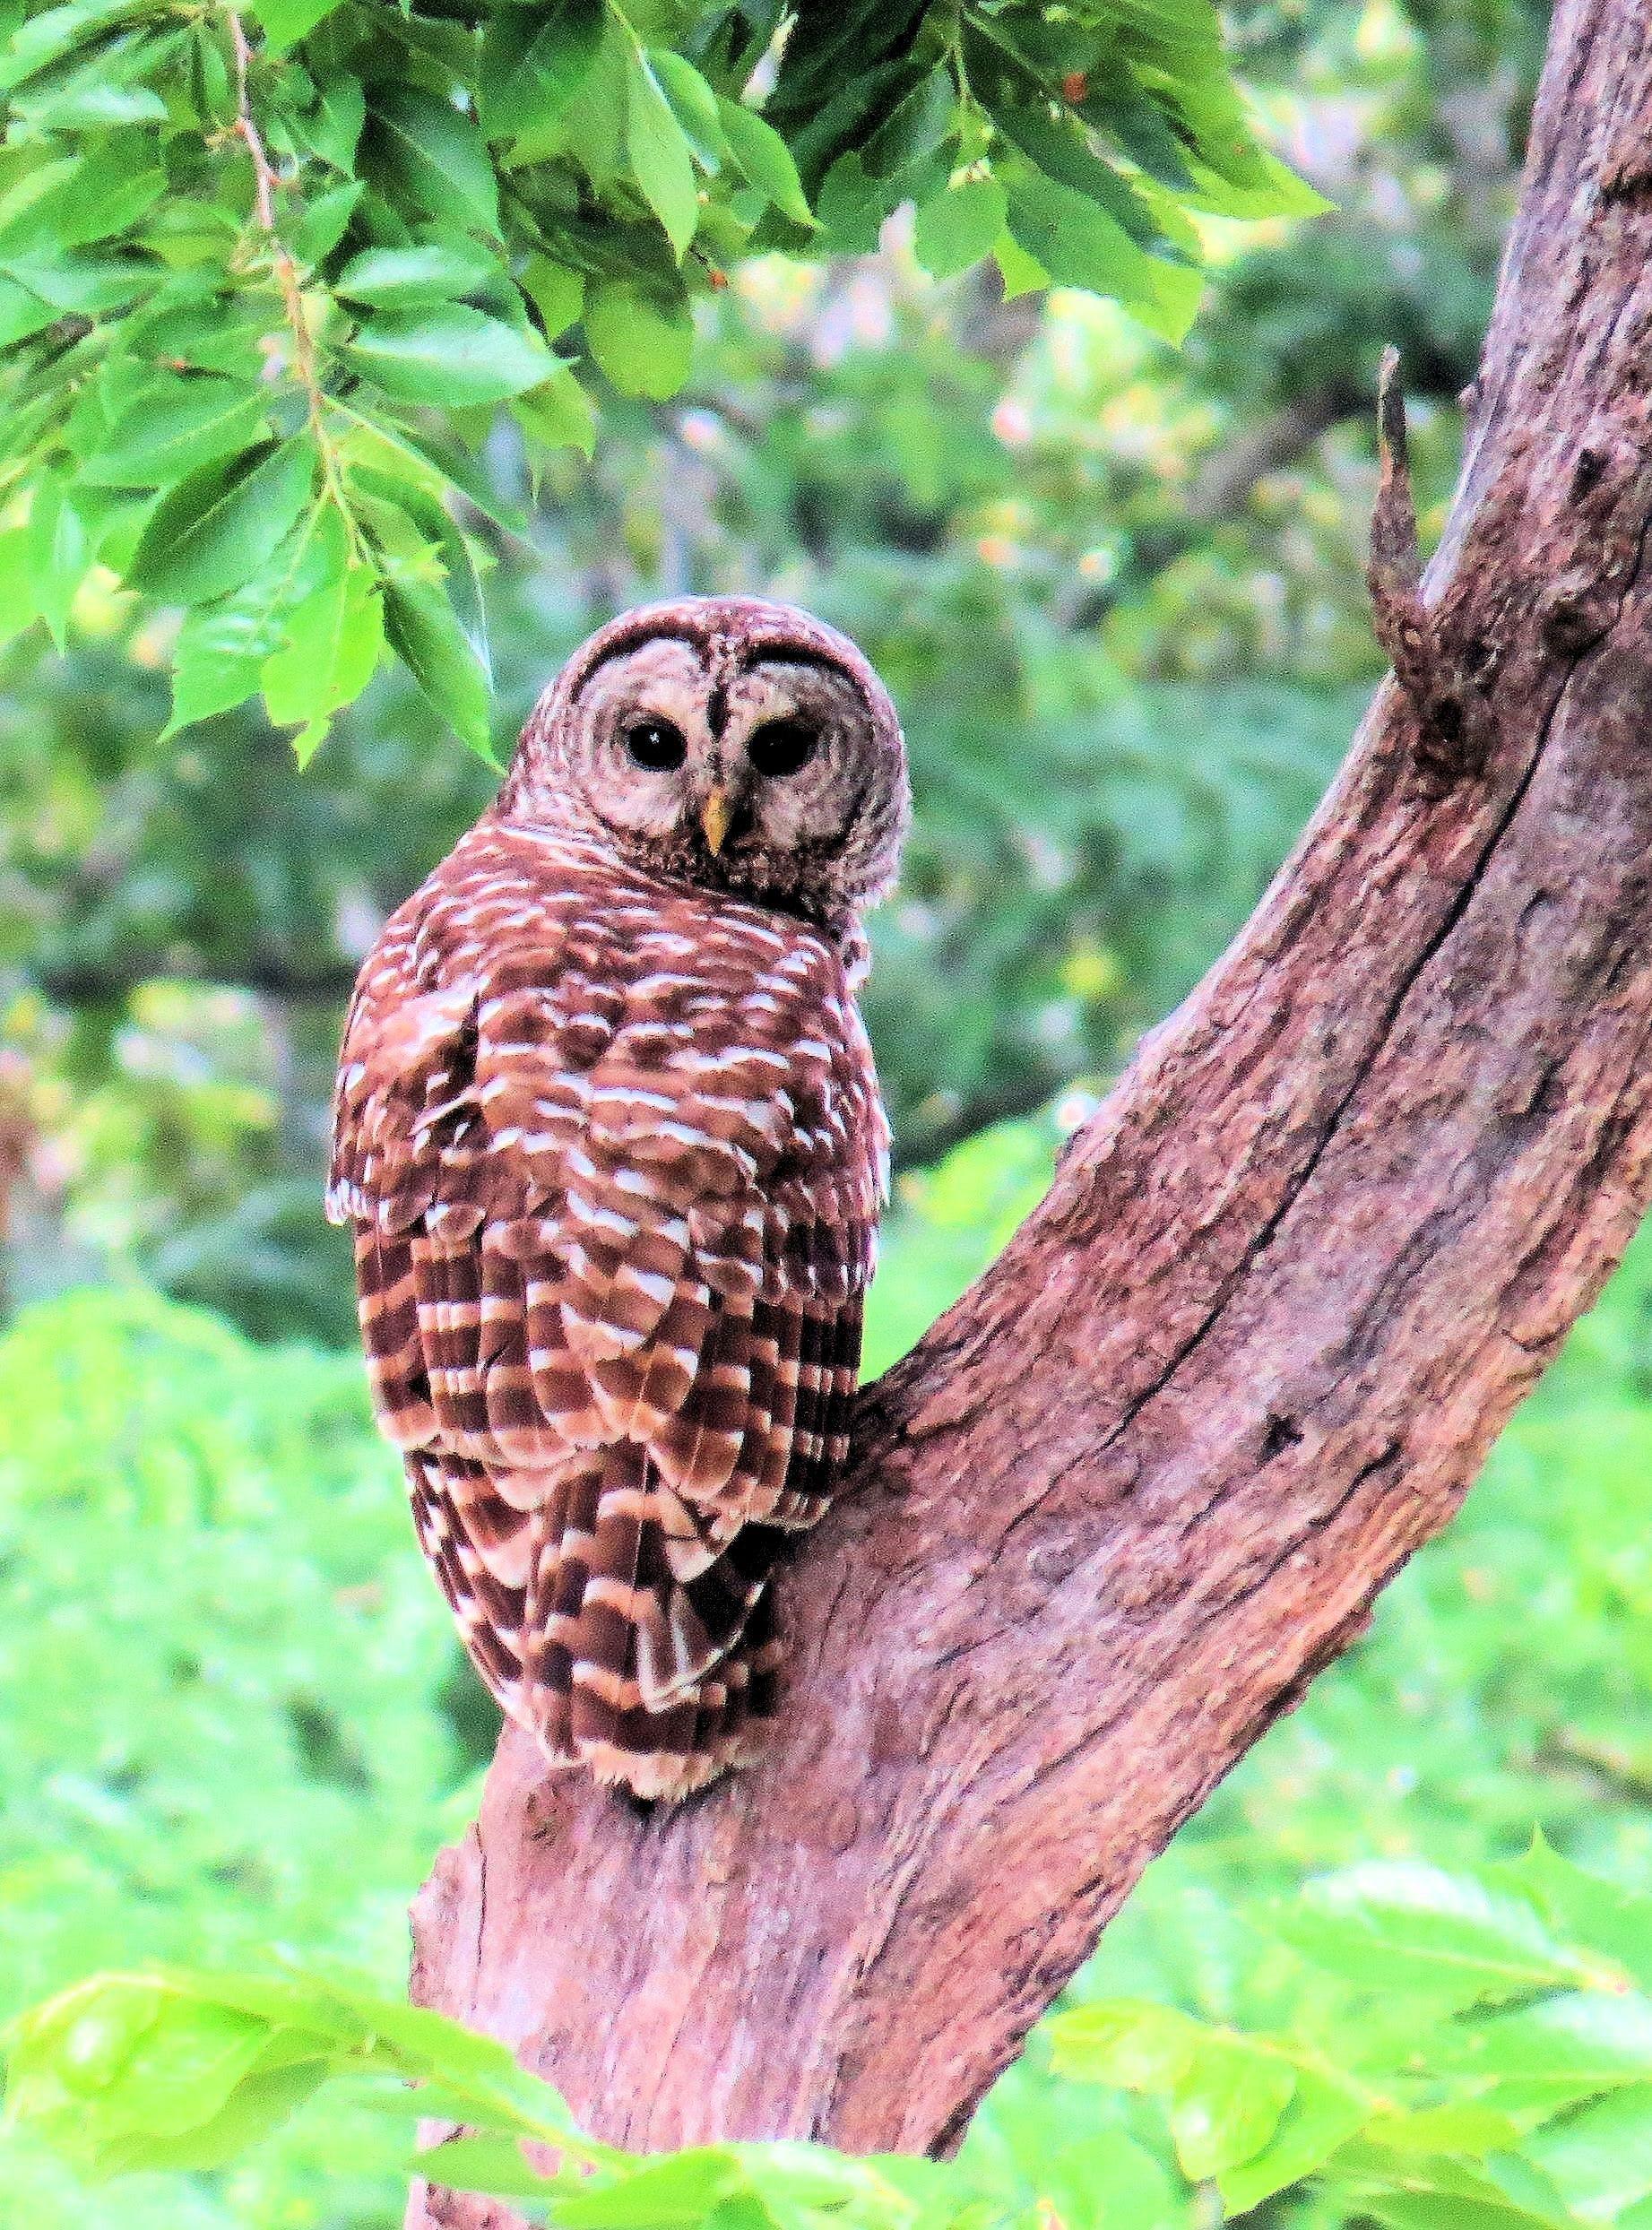 Free stock photo of staring, bird of prey, owls, missouri